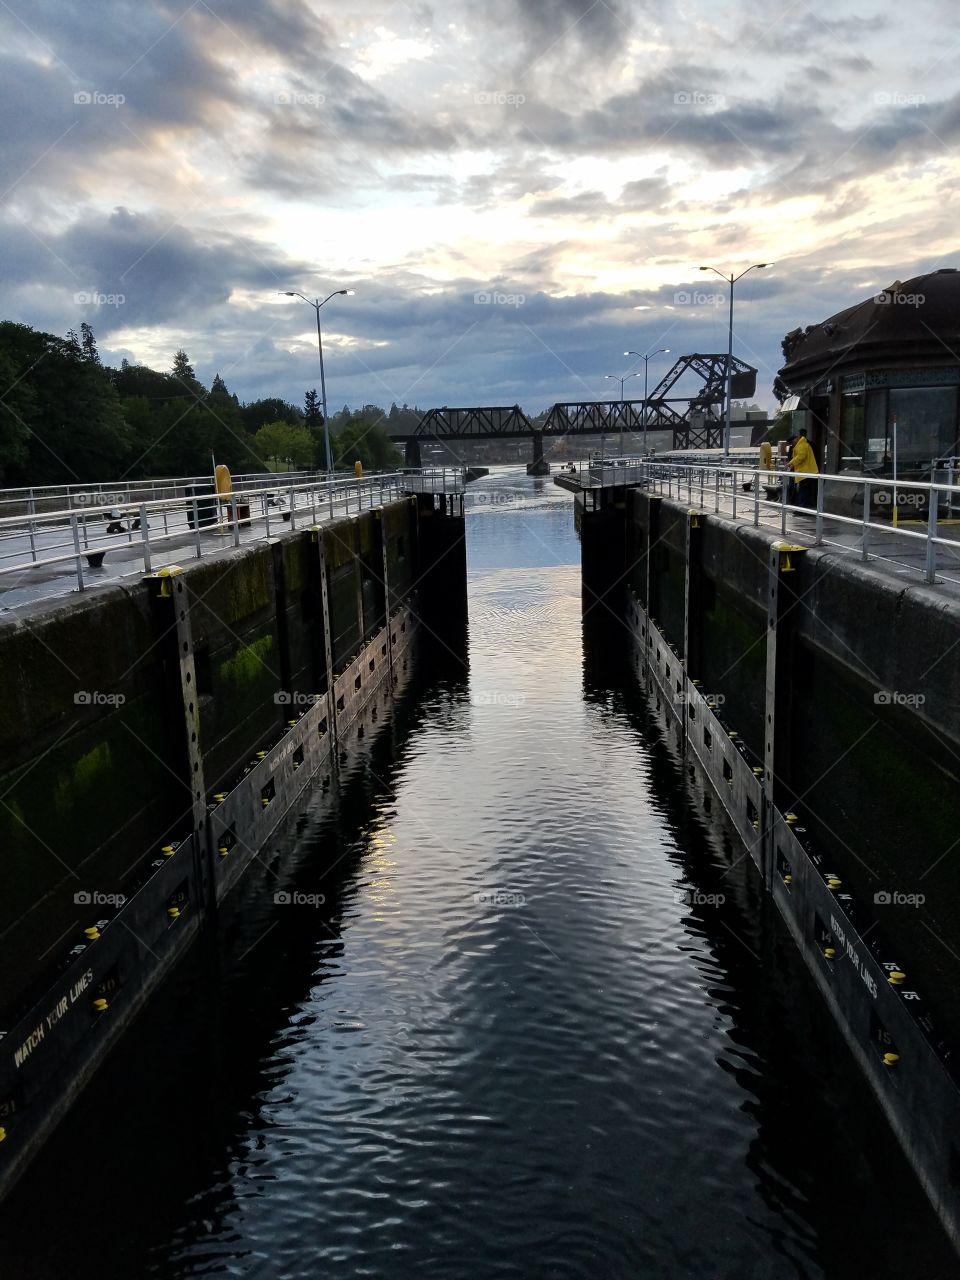 small chamber with gates on salt water side in motion. Hiram M Chittenden Locks. Seattle, Washington 5/19/2016